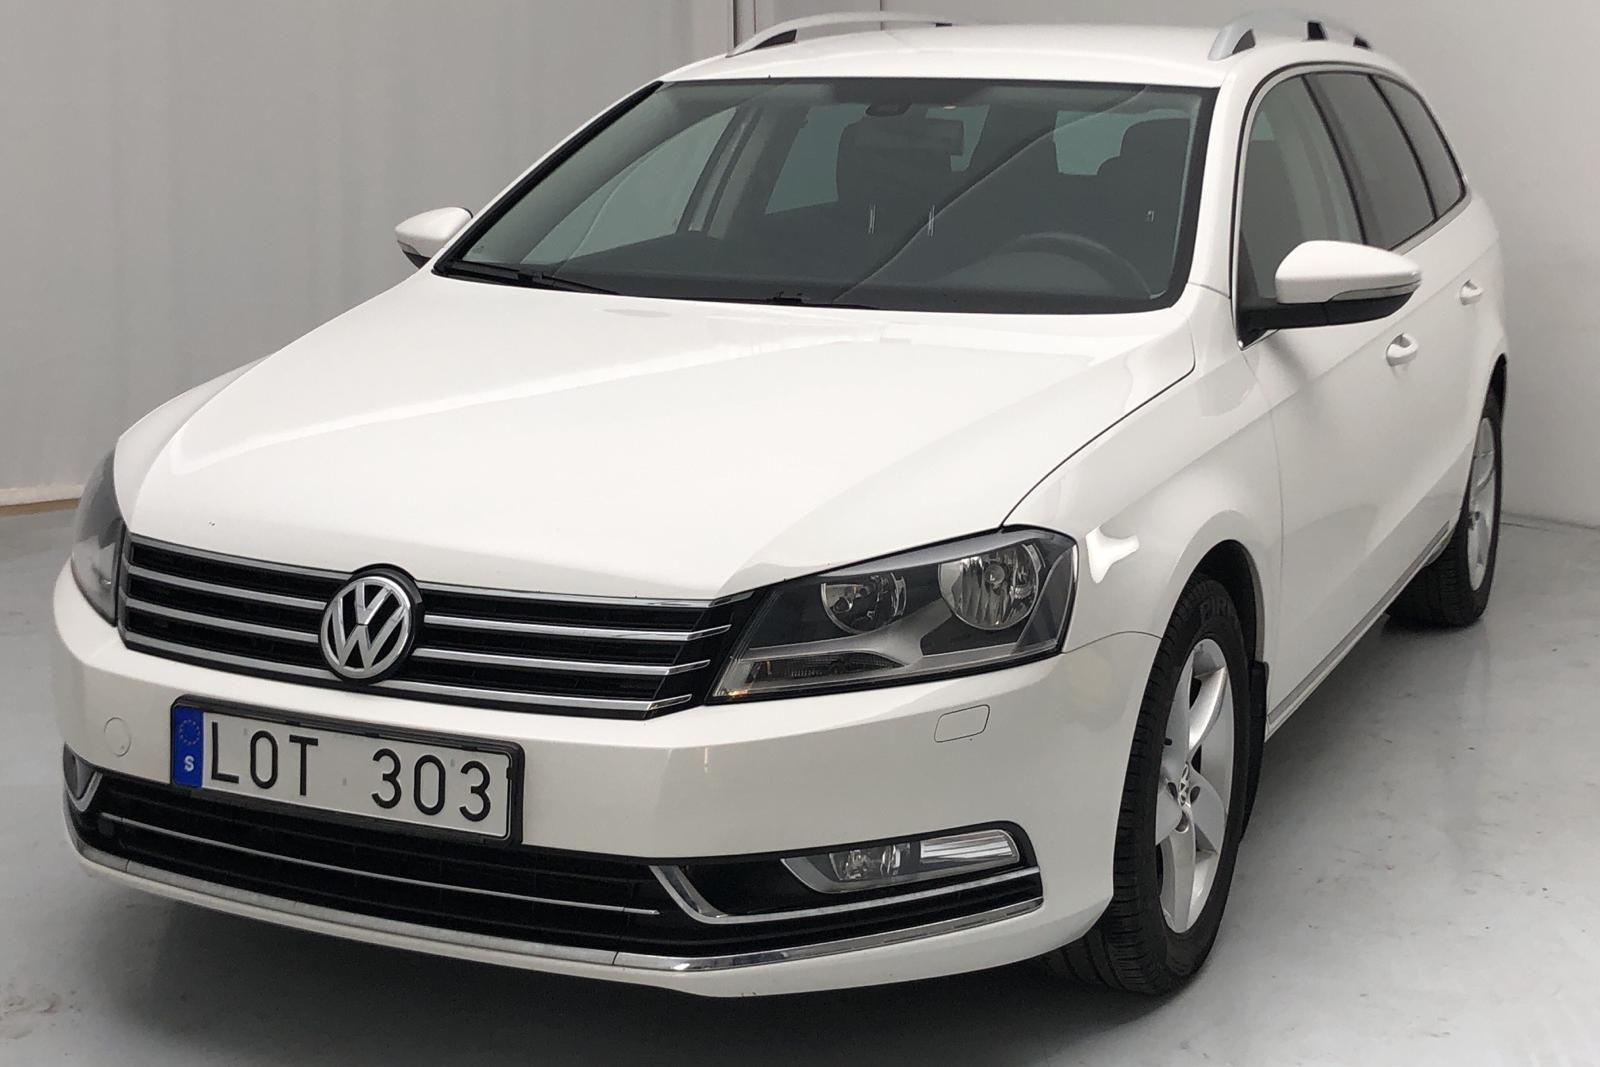 VW Passat 1.4 TSI Mehrstoffvariante (160 hk)